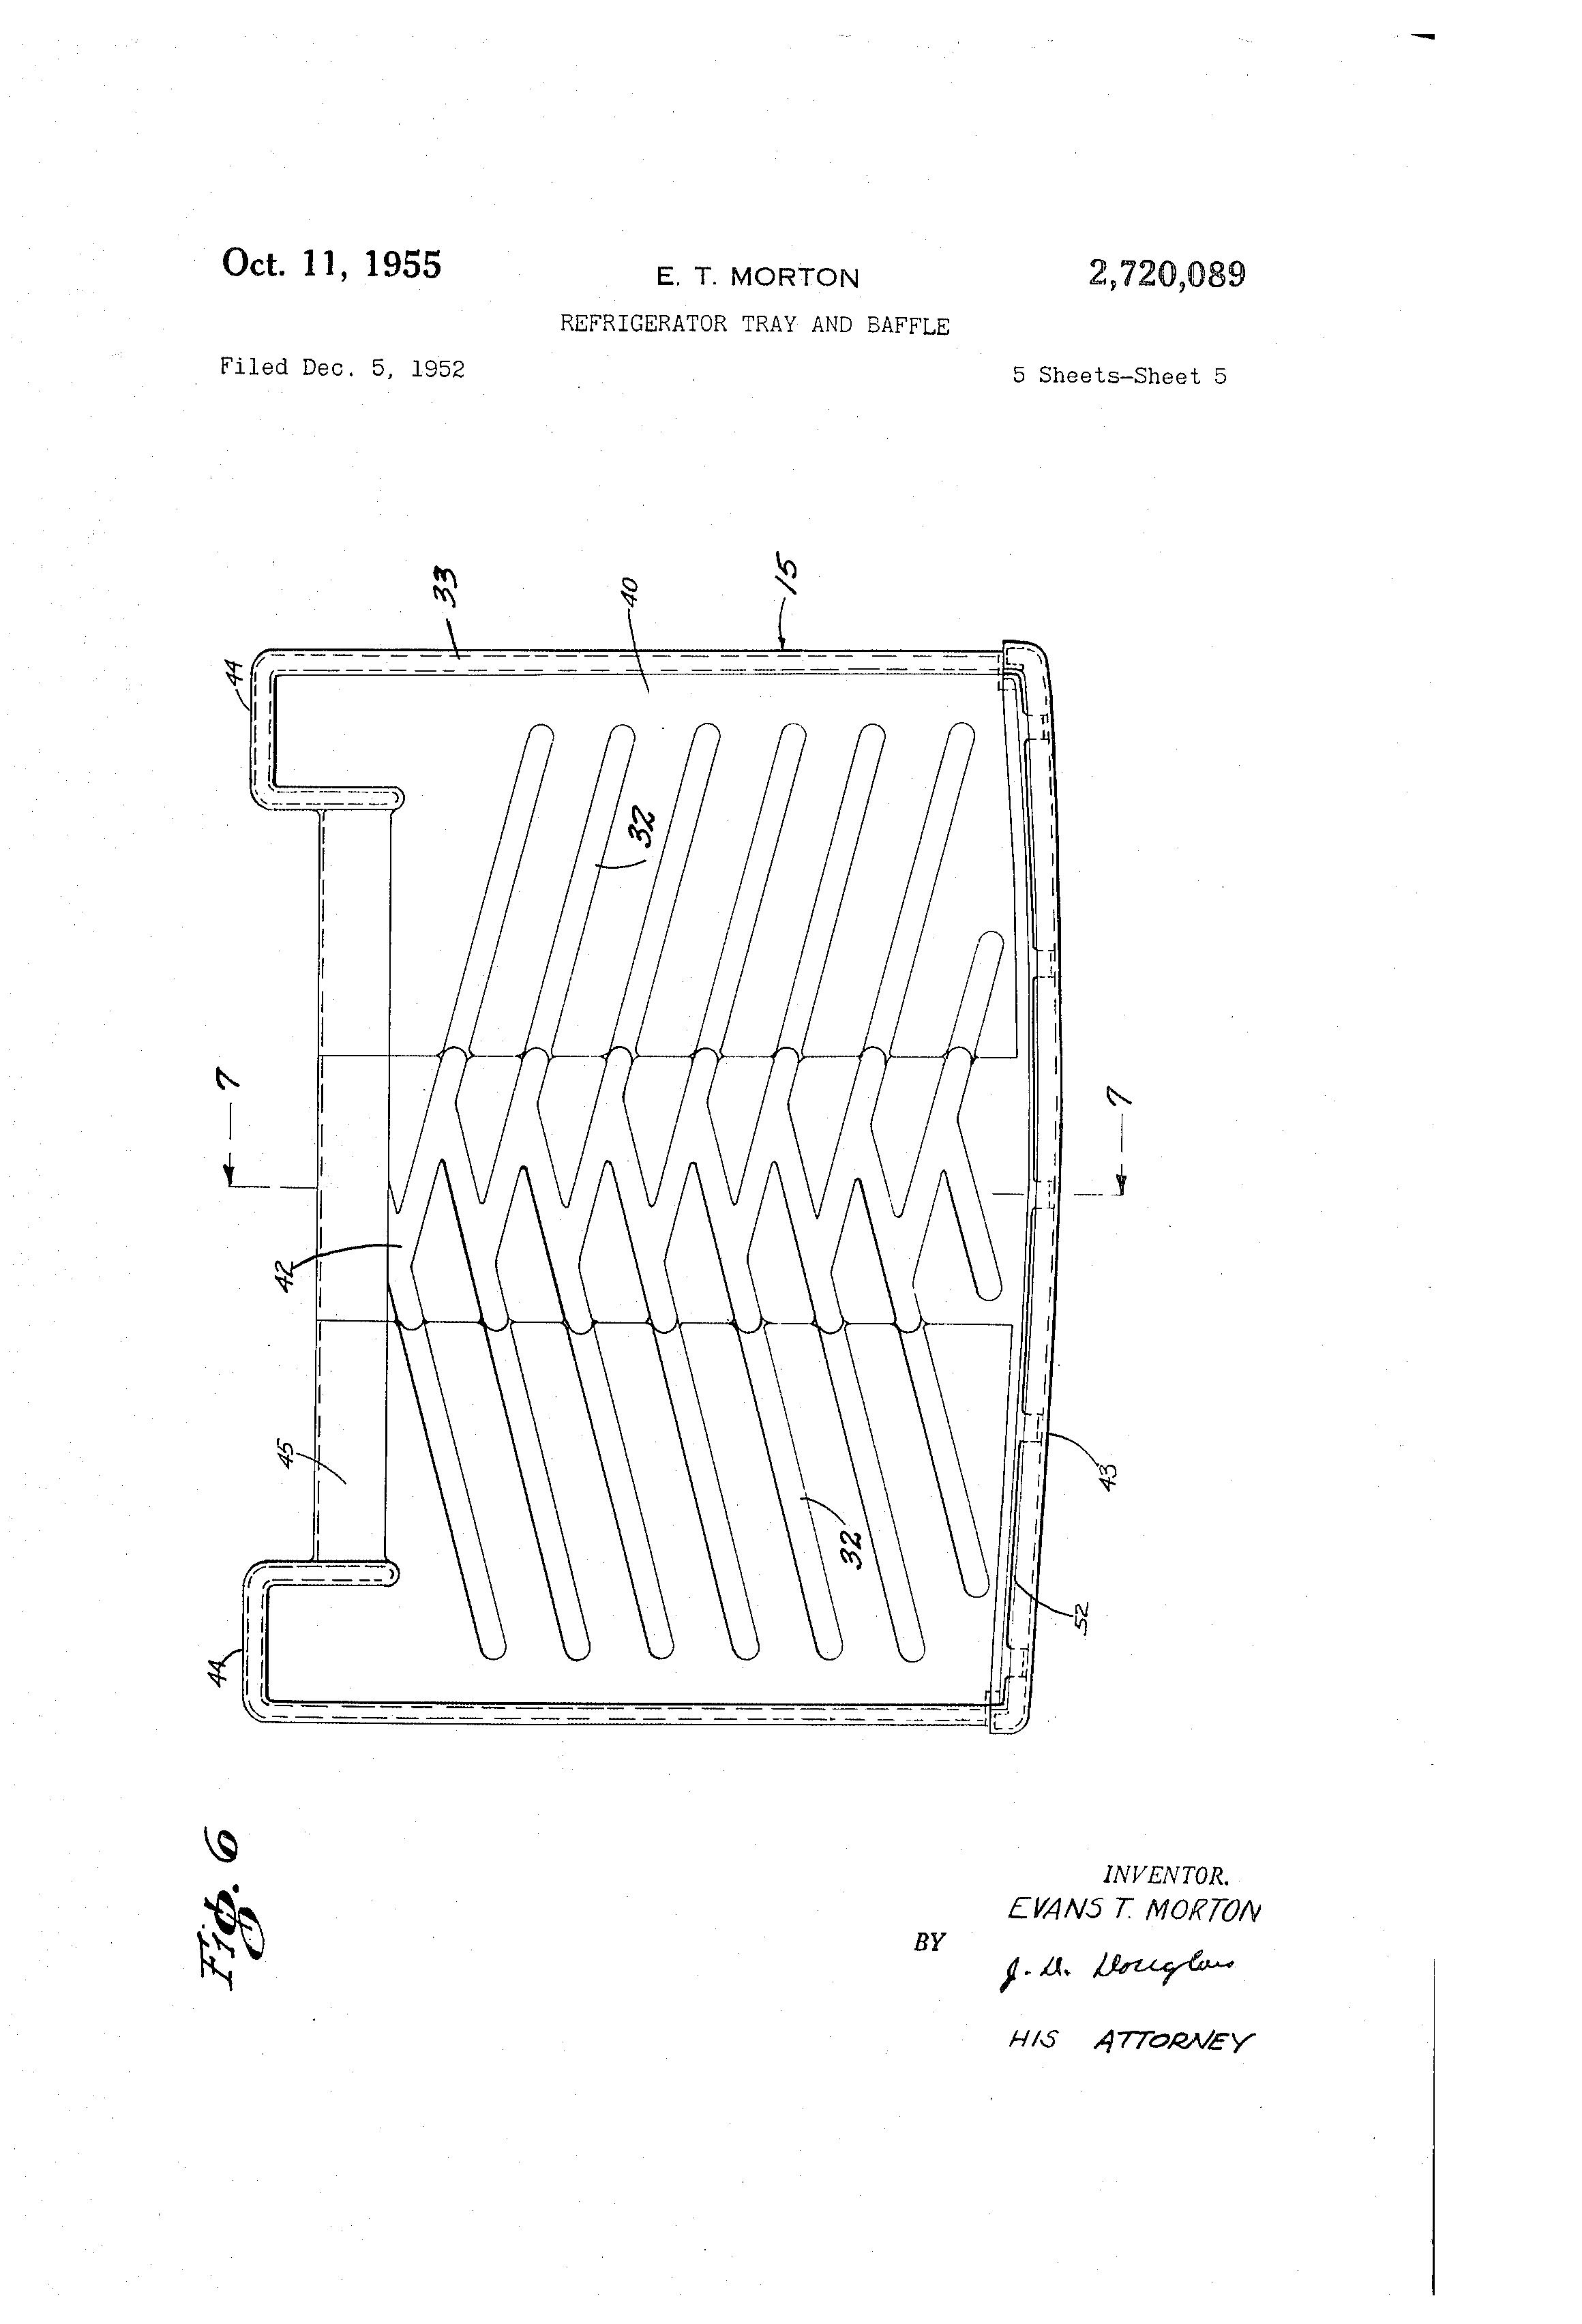 Kelvinator Refrigerator Wiring Diagram : Sole f treadmill wiring diagram folded